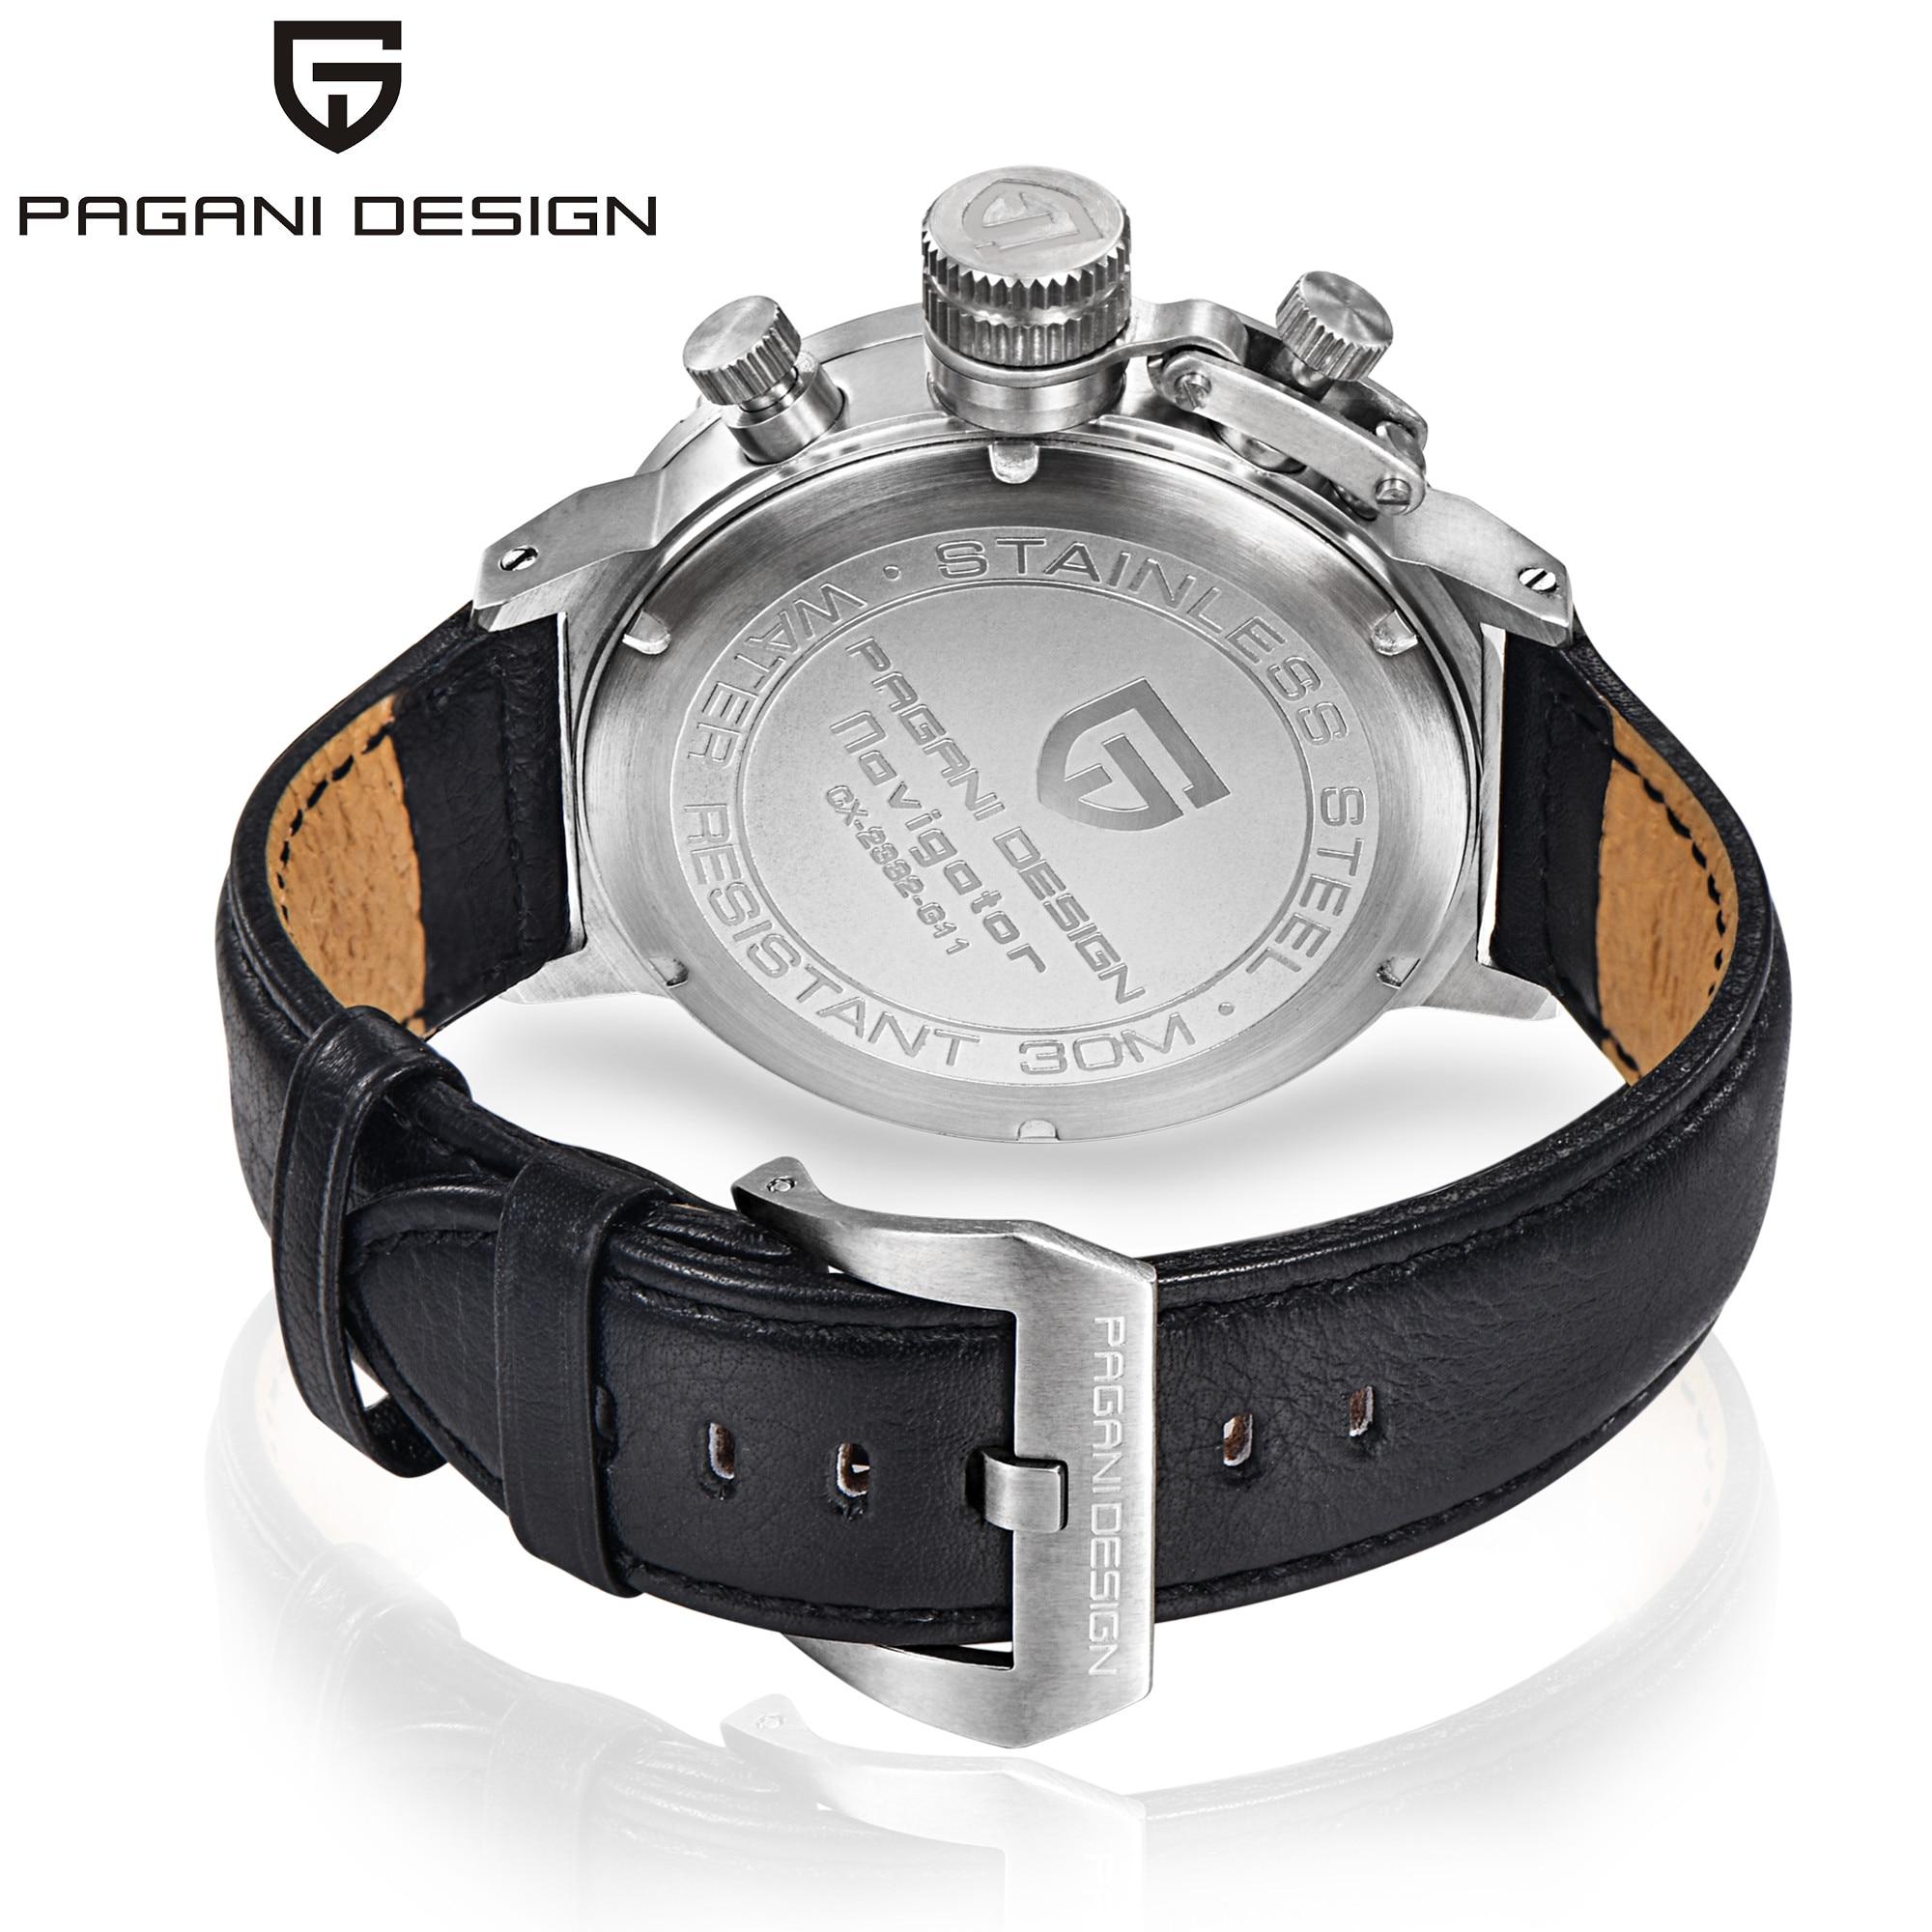 2019 PAGANI DESIGN Sport Uhren Männer Mode Multifunktions Dive Chronograph Quarz Uhren Herren Relogio Masculino Leder Uhr - 6